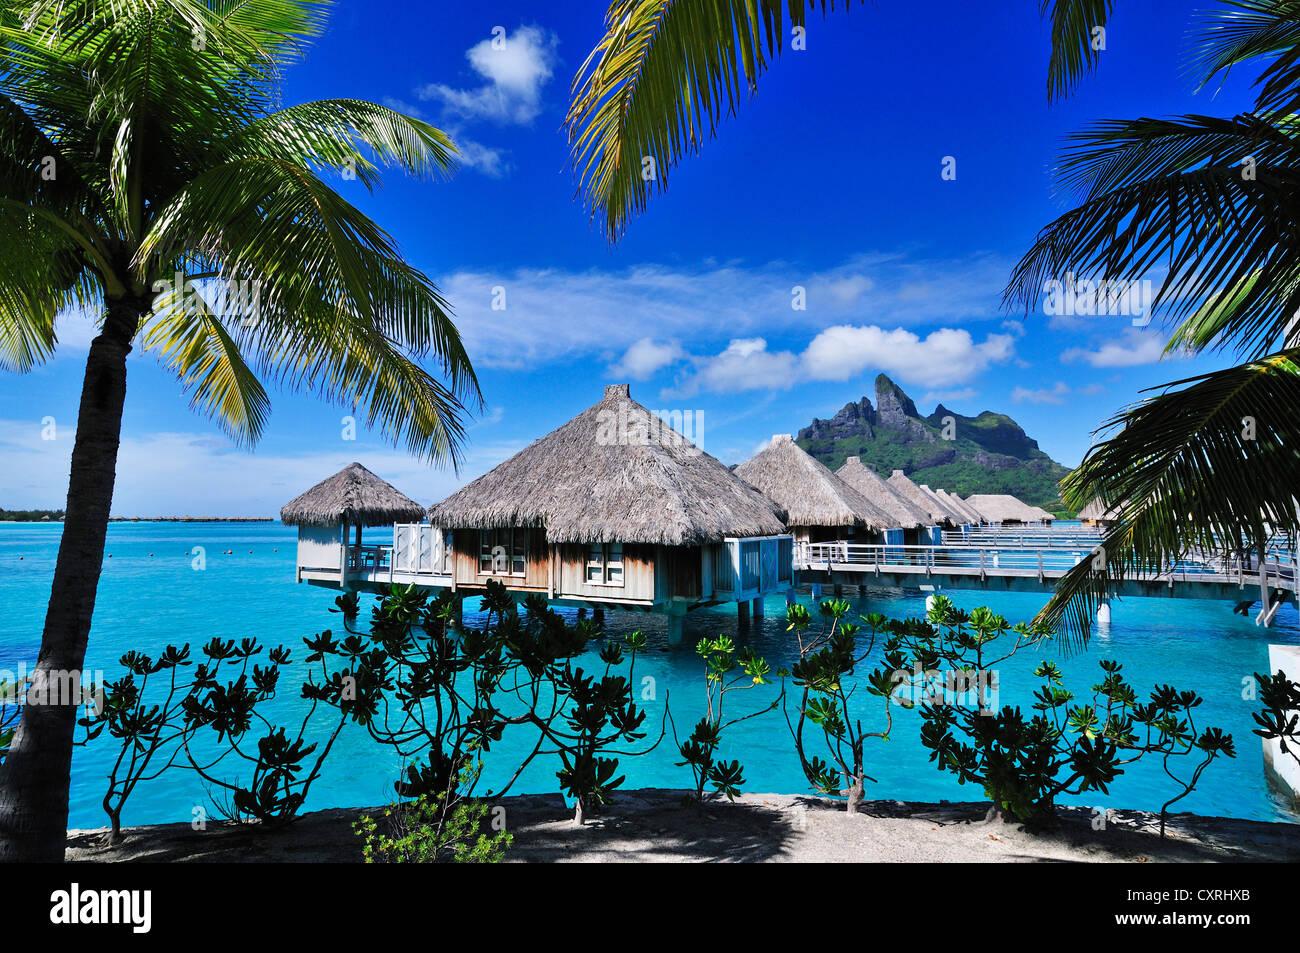 St Regis Bora Bora Resort Bora Bora Leeward Islands Society